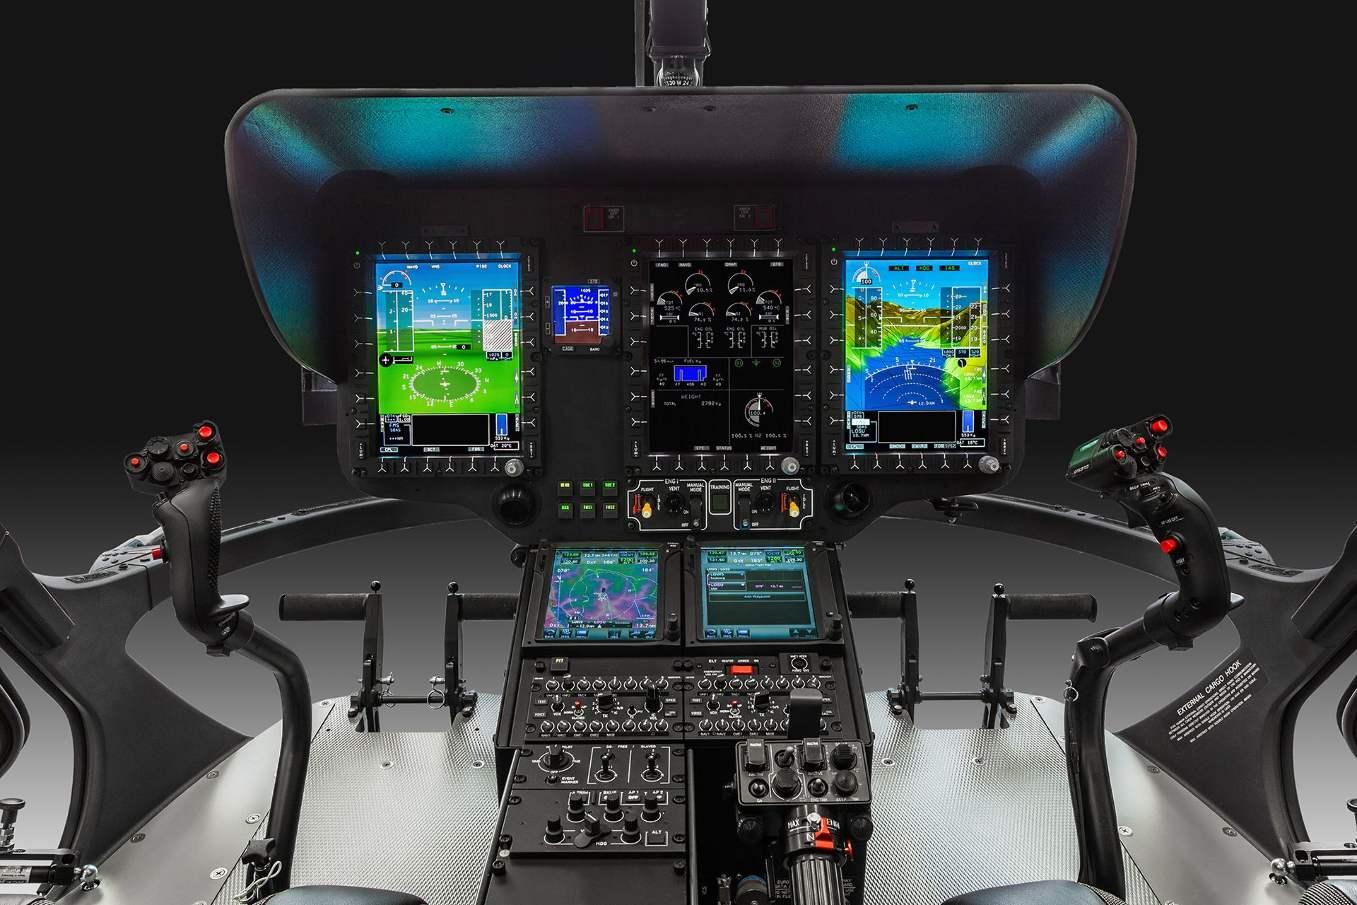 Engine warranty extension, enhanced avionics for Airbus H145